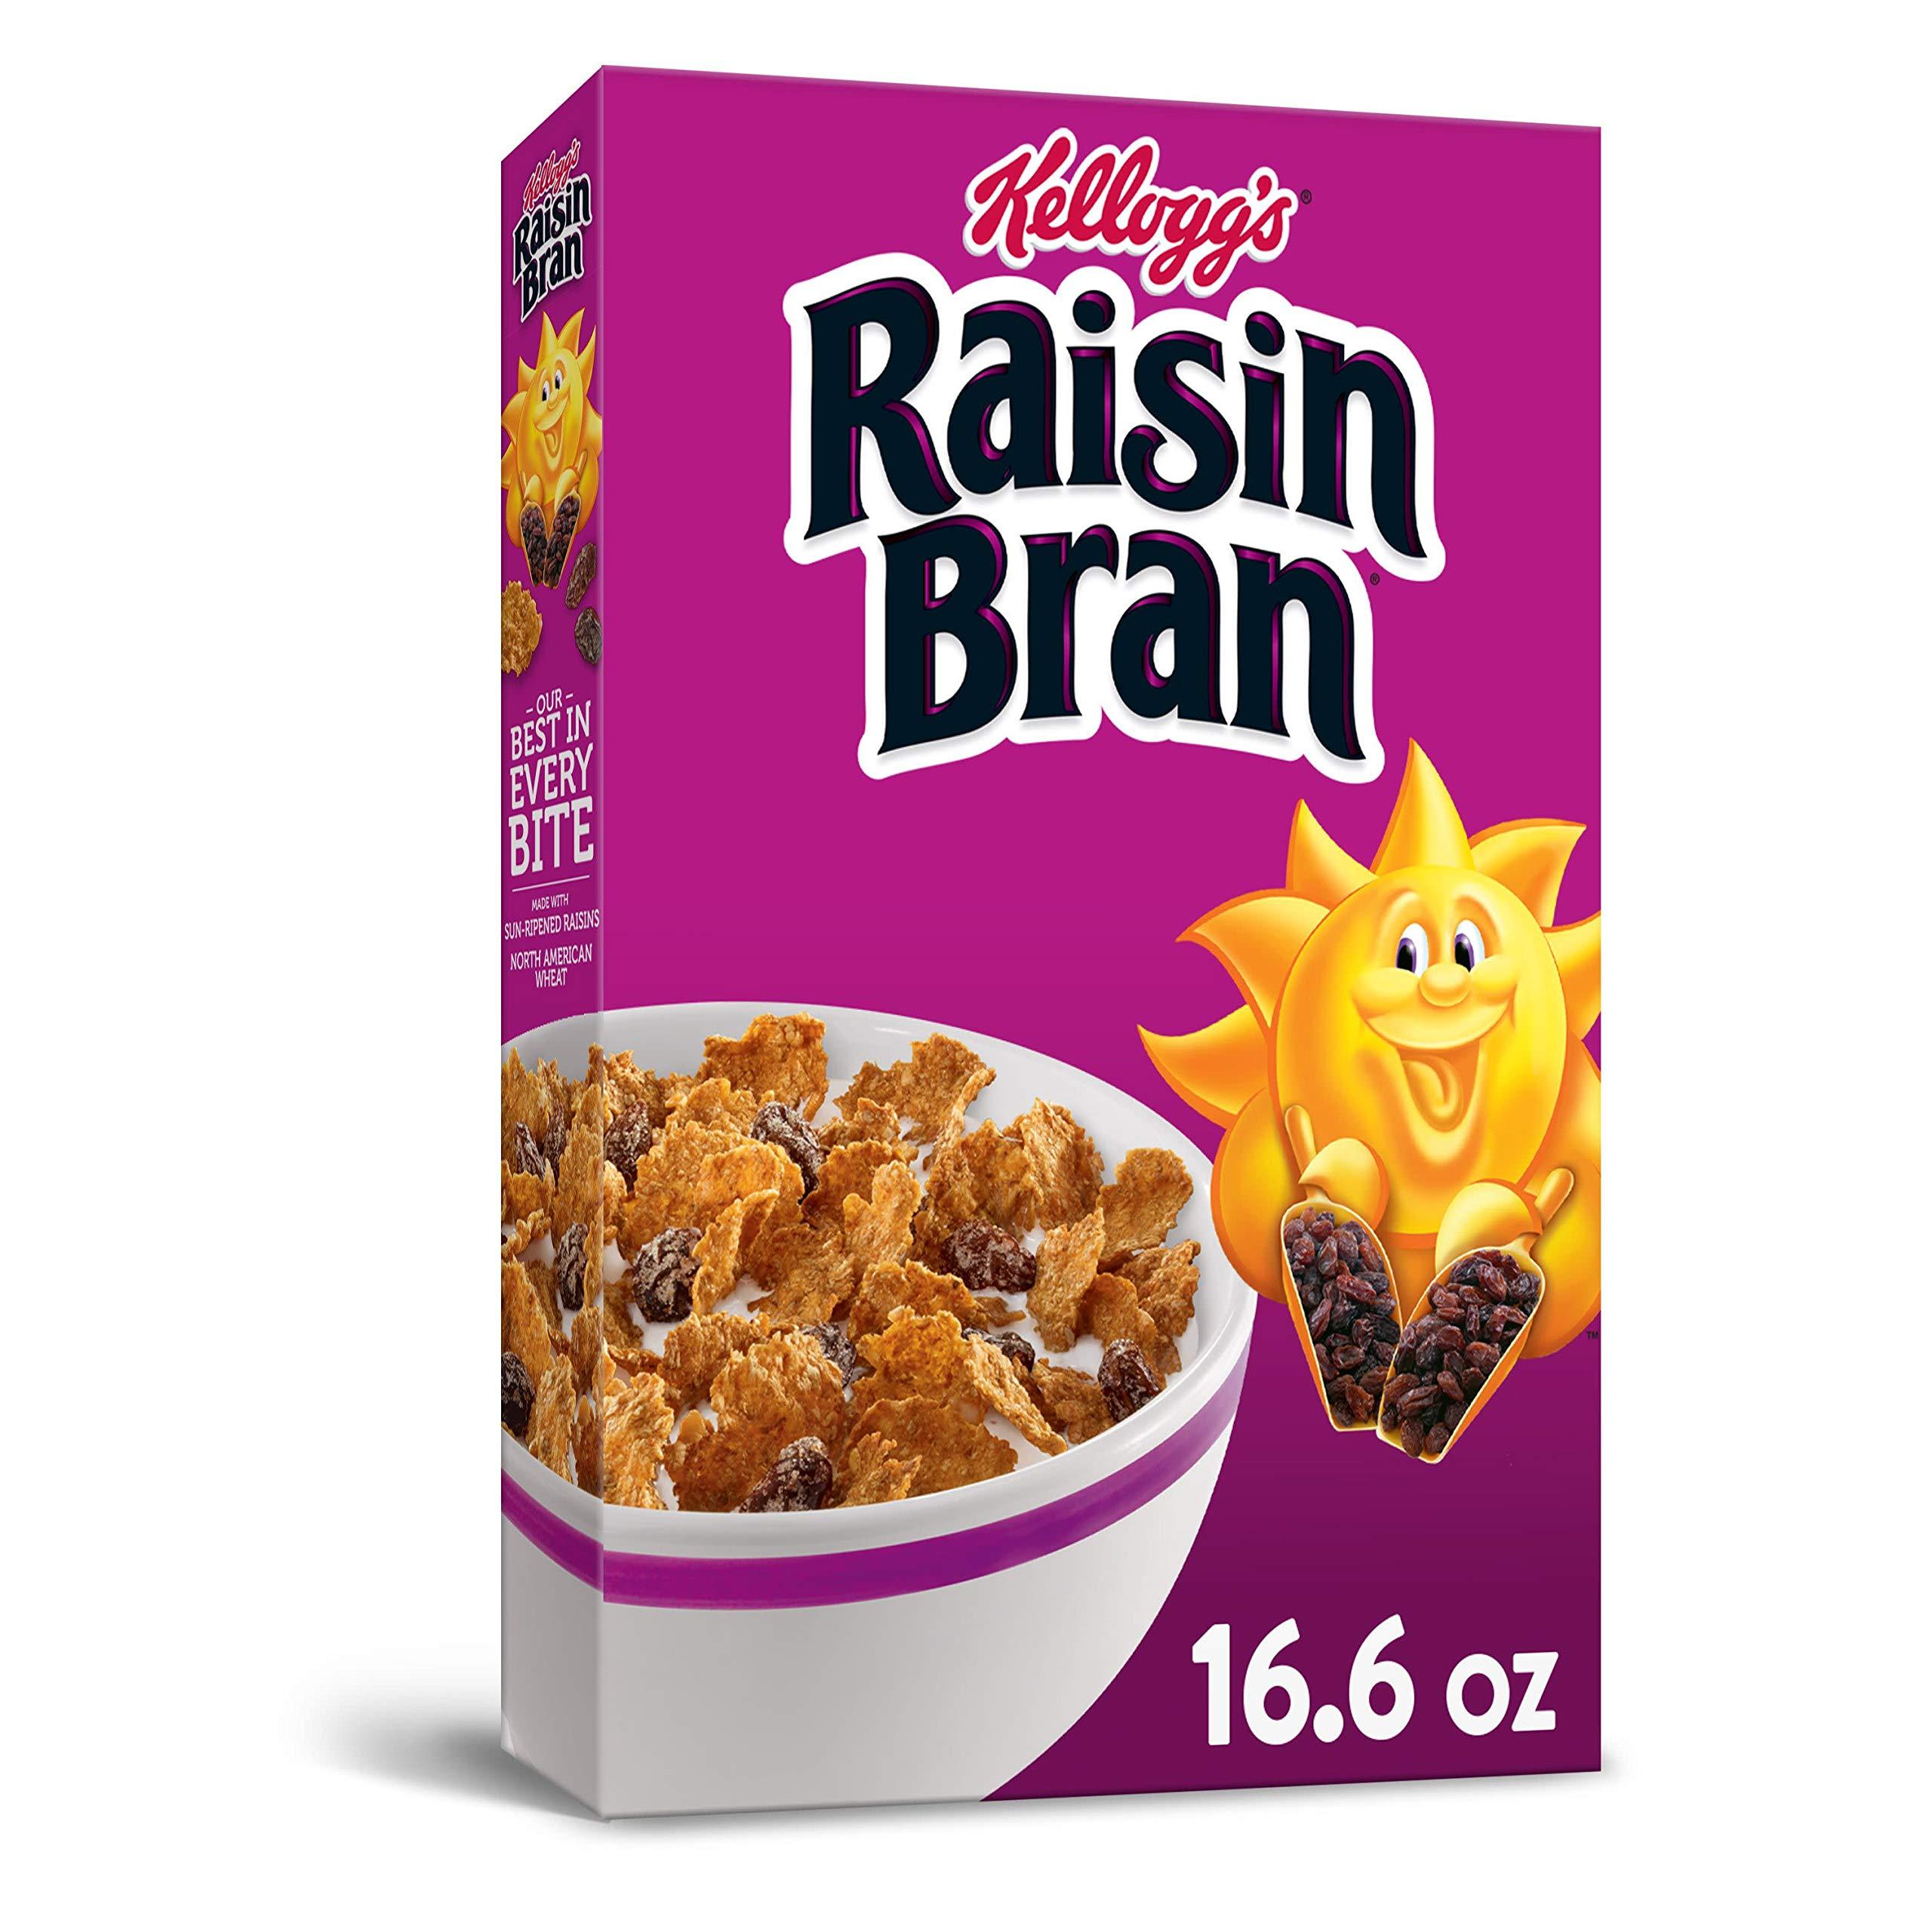 Kellogg's Raisin Bran, Breakfast Cereal, Original, Excellent Source of Fiber, 16.6oz Box